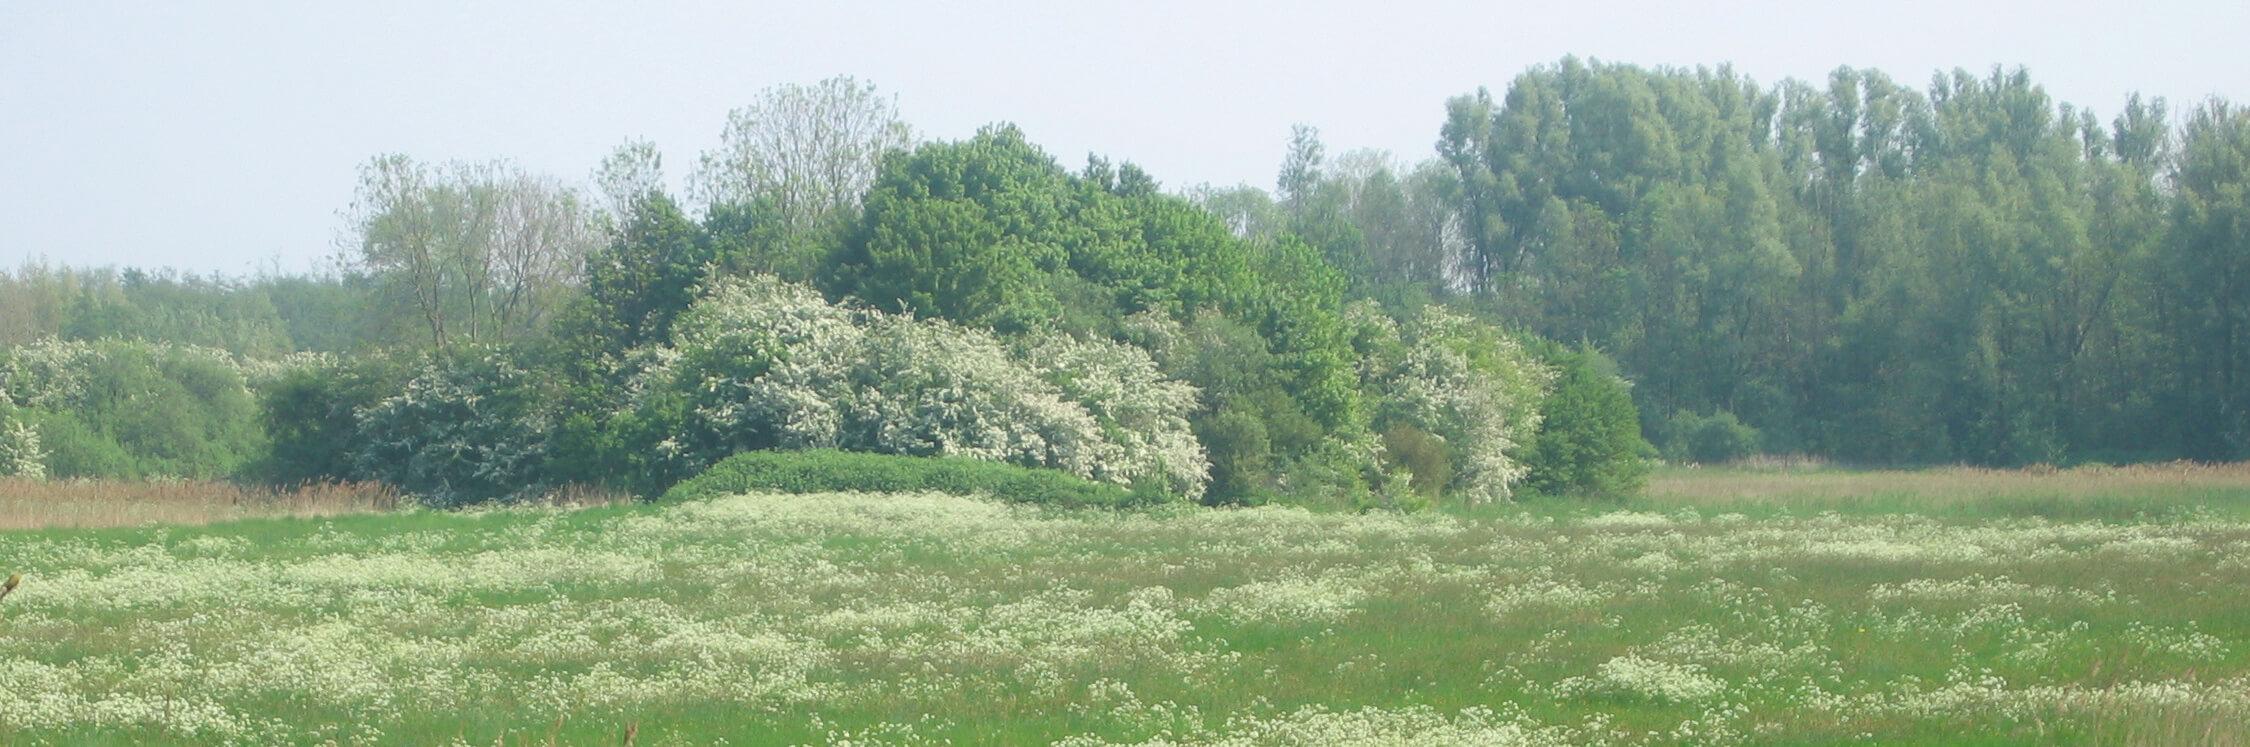 groen veld en bomen